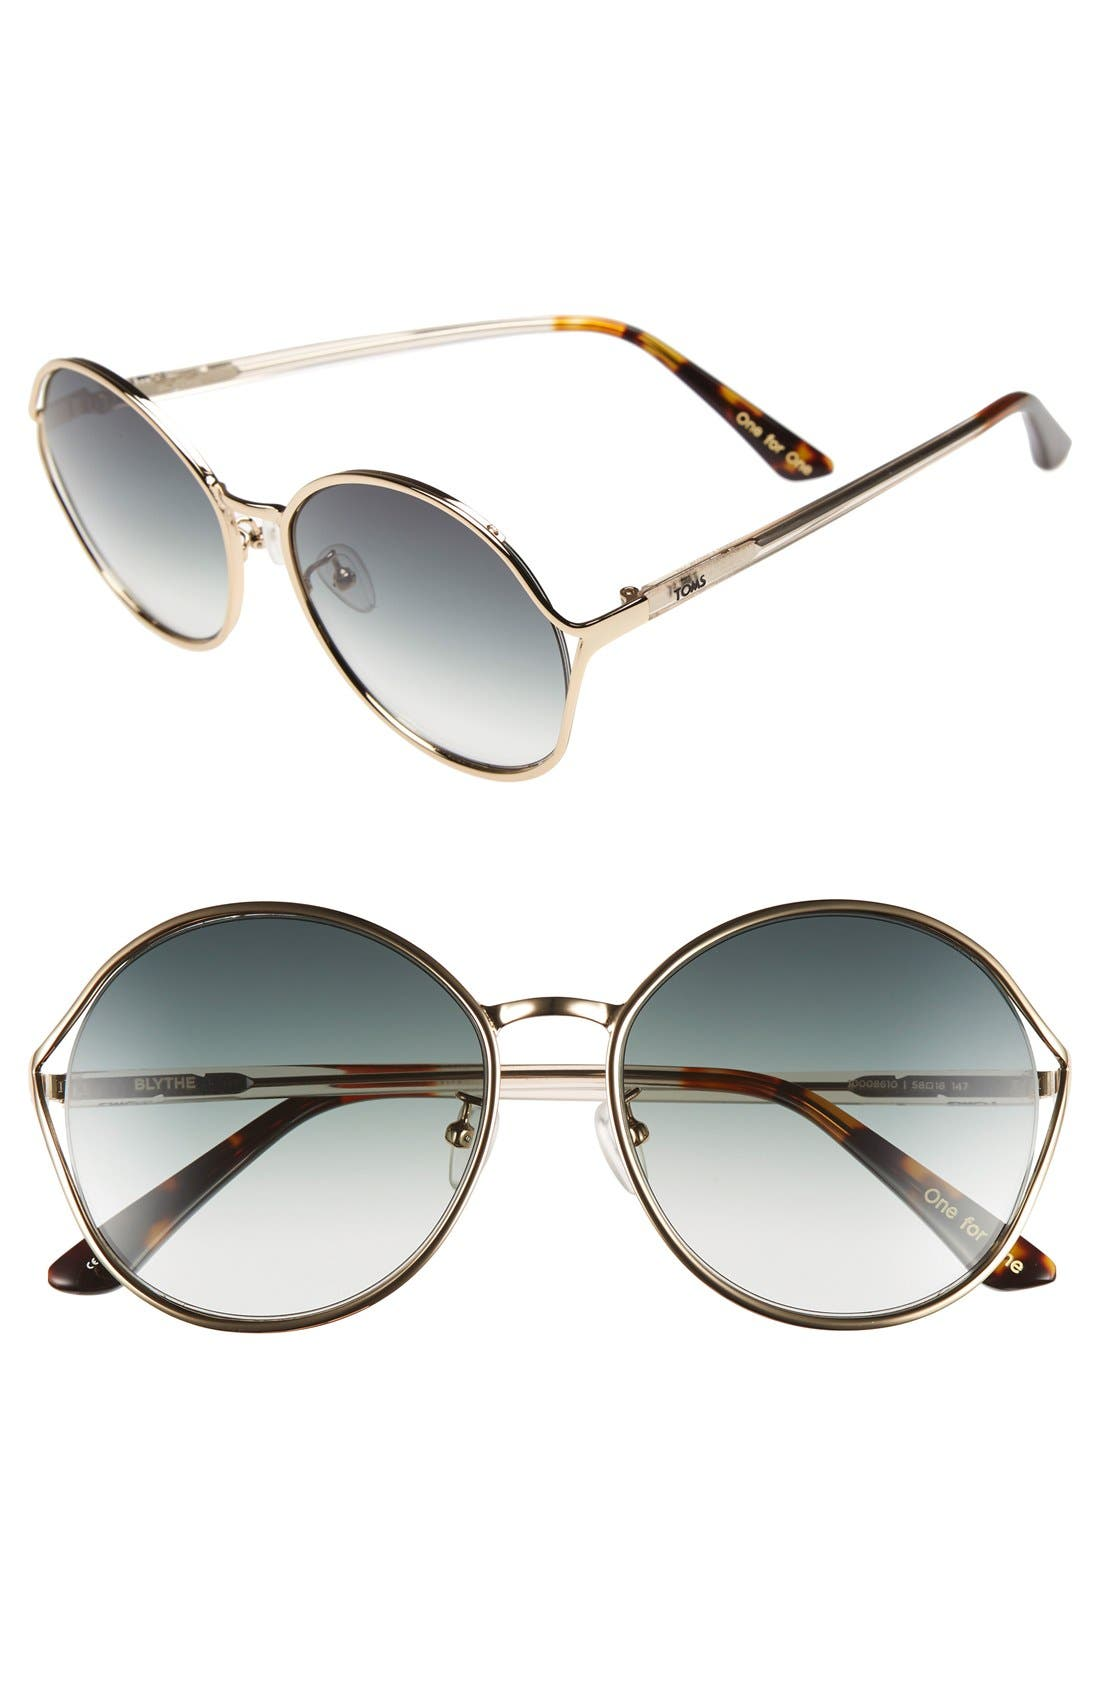 Main Image - TOMS 'Blythe' 57.5mm Sunglasses